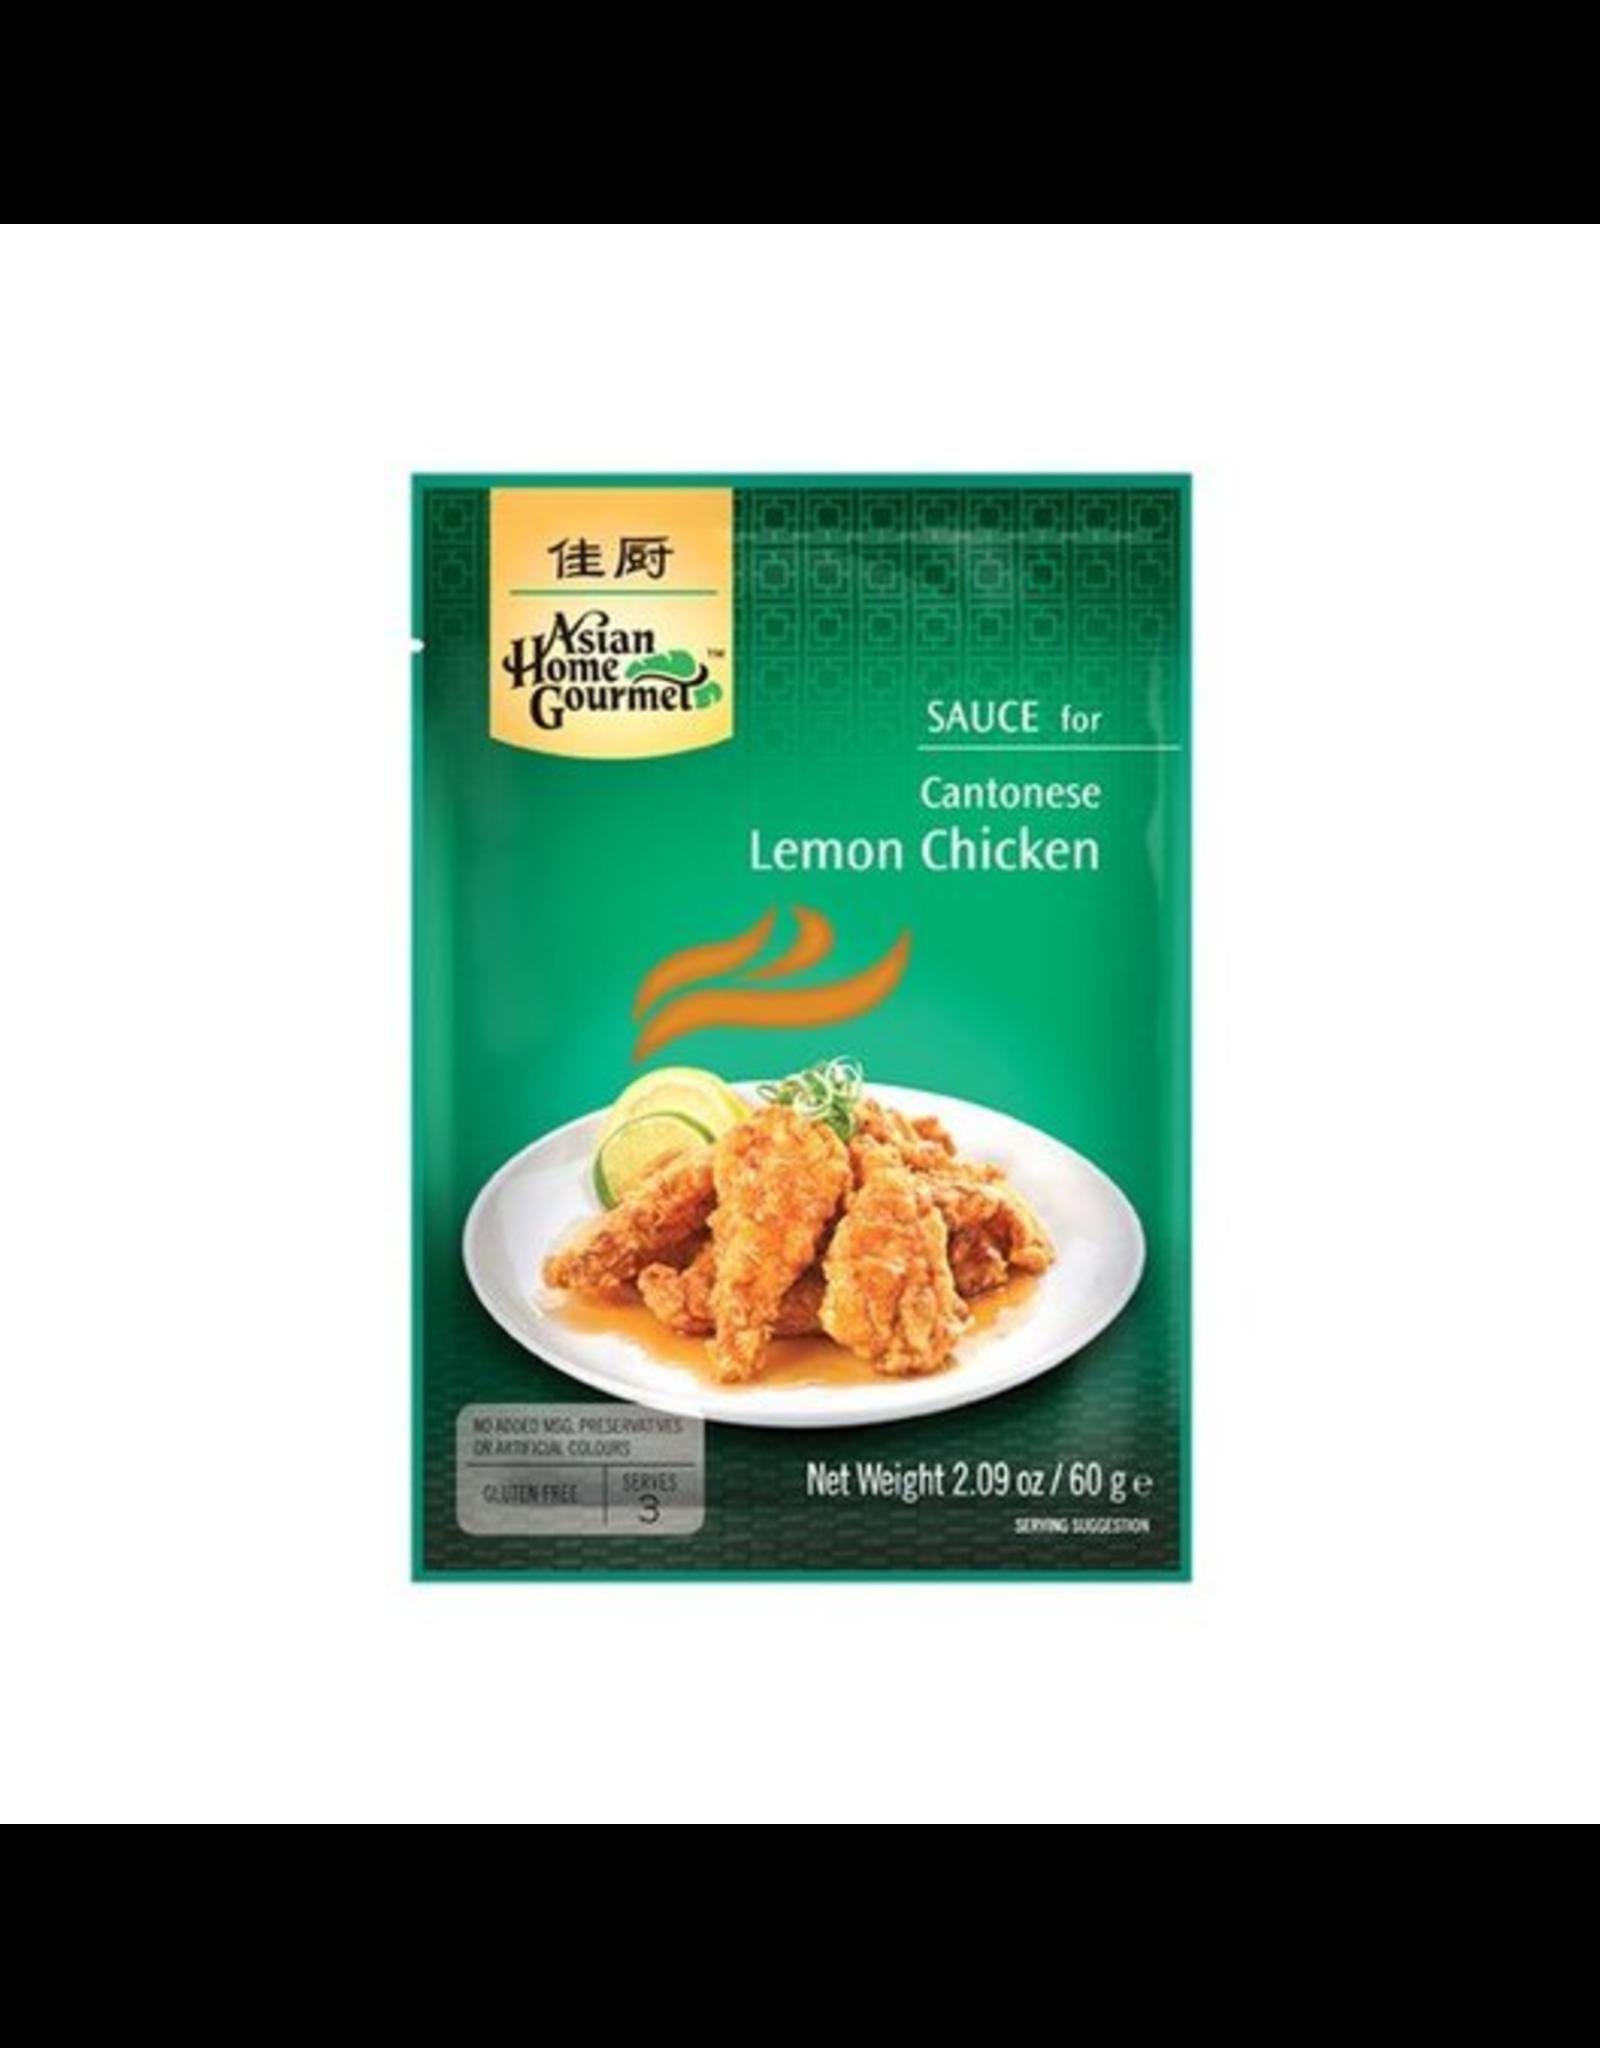 Asian Home Gourmet Cantonese Lemon Chicken